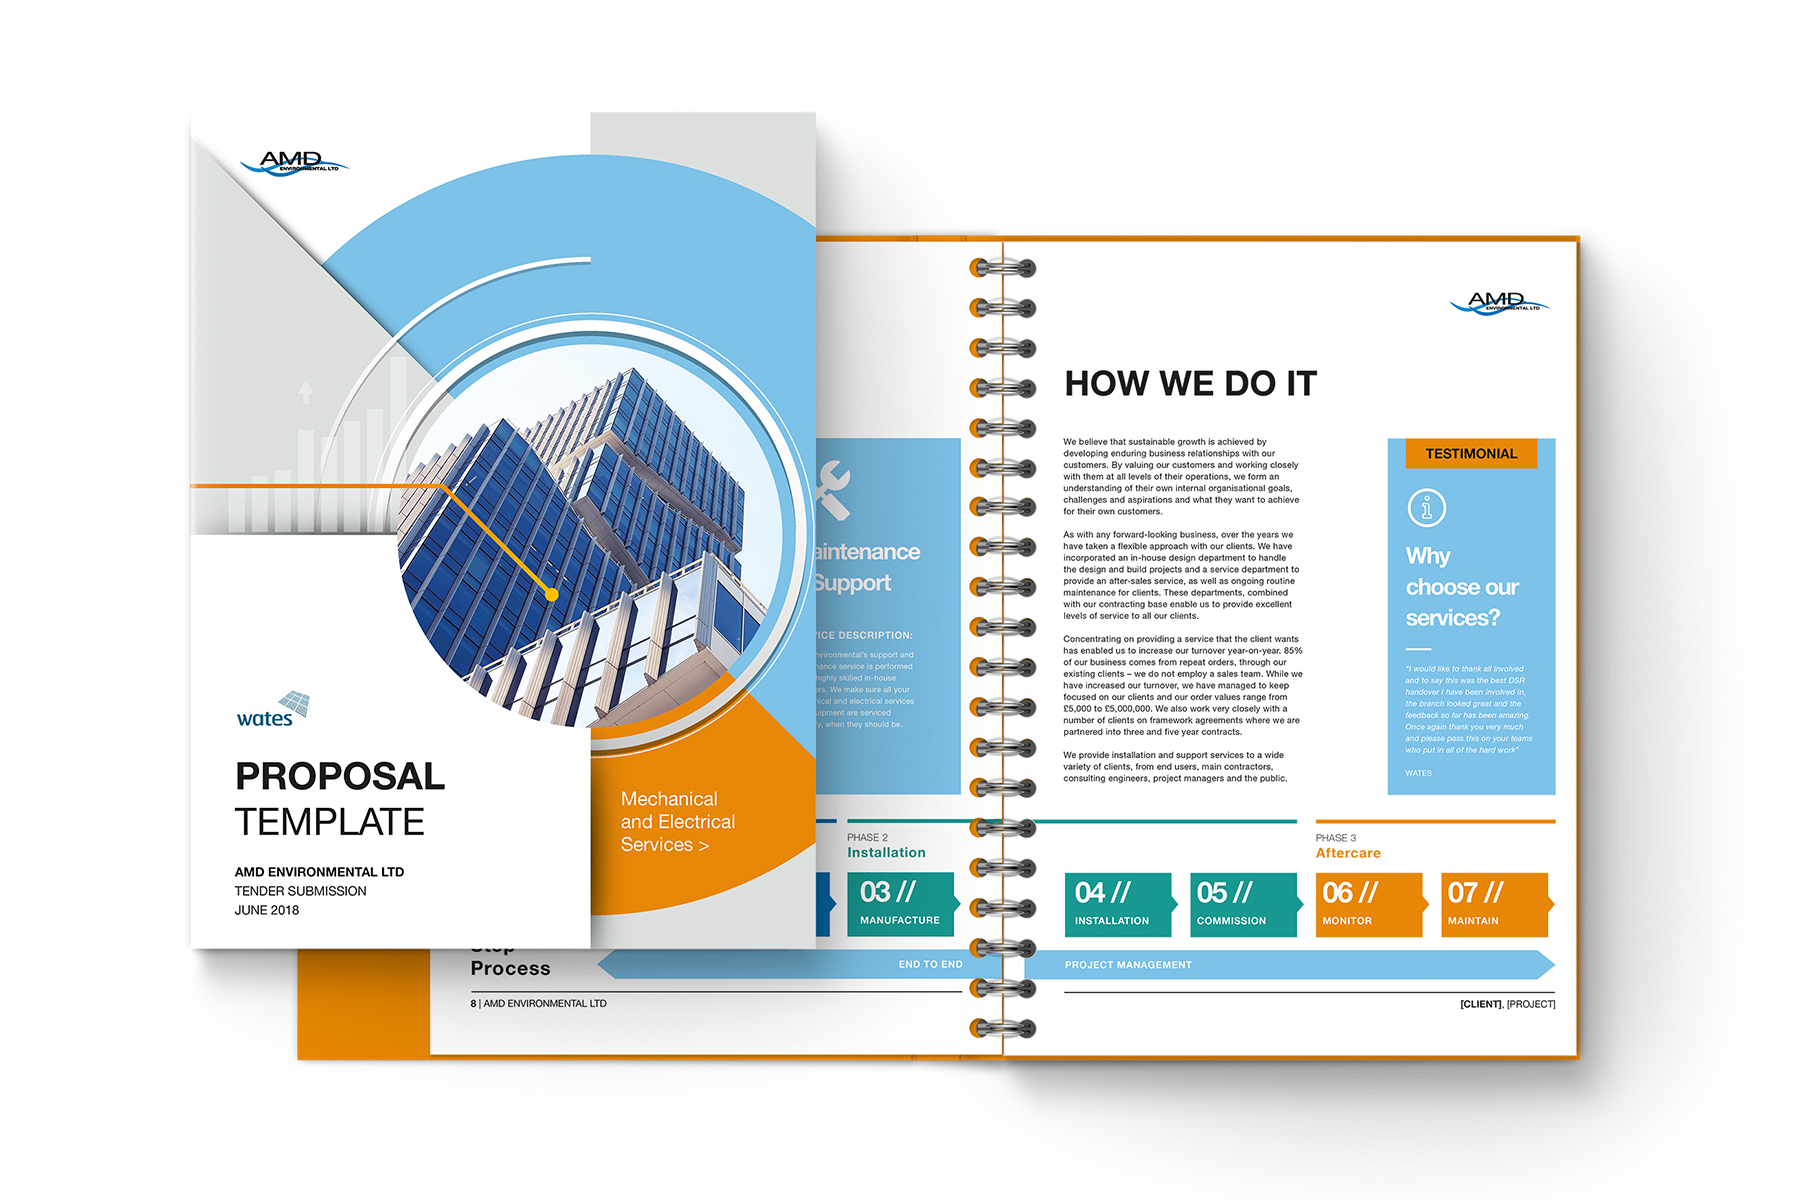 amd-proposal-template.jpg